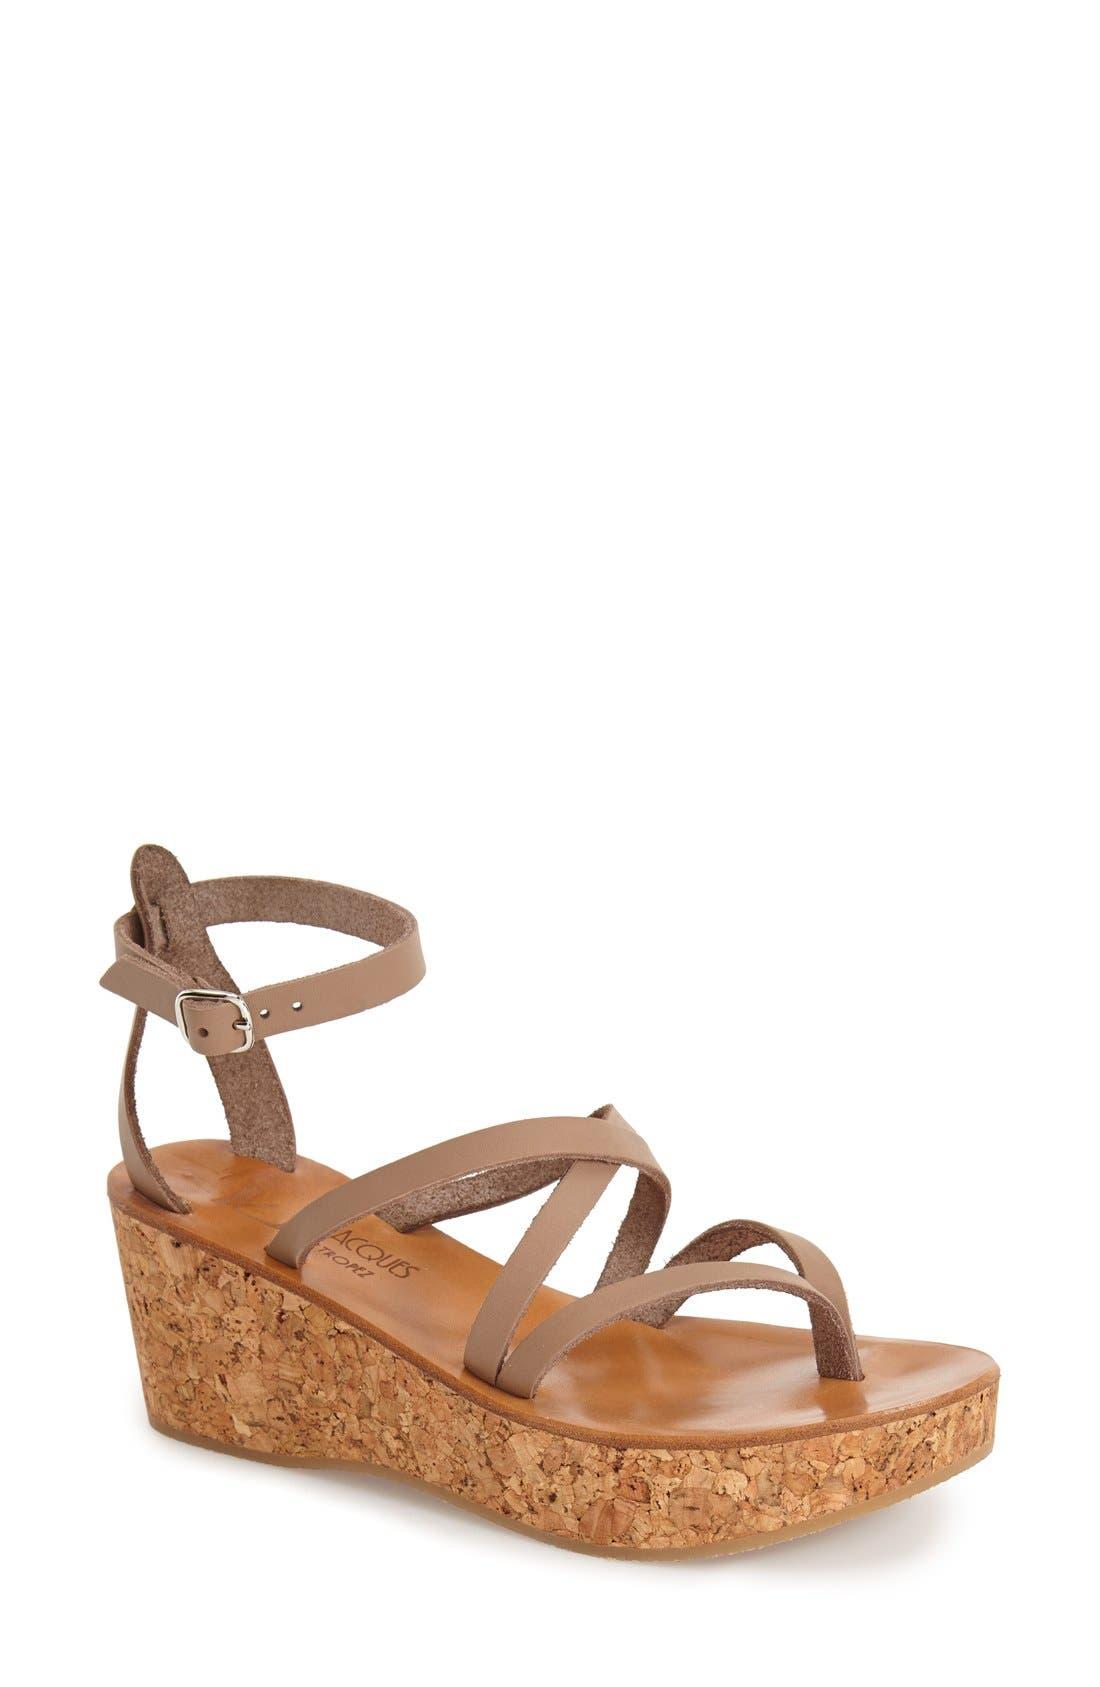 Alternate Image 1 Selected - K.Jacques St. Tropez 'Cunegonde' Wedge Sandal (Women)